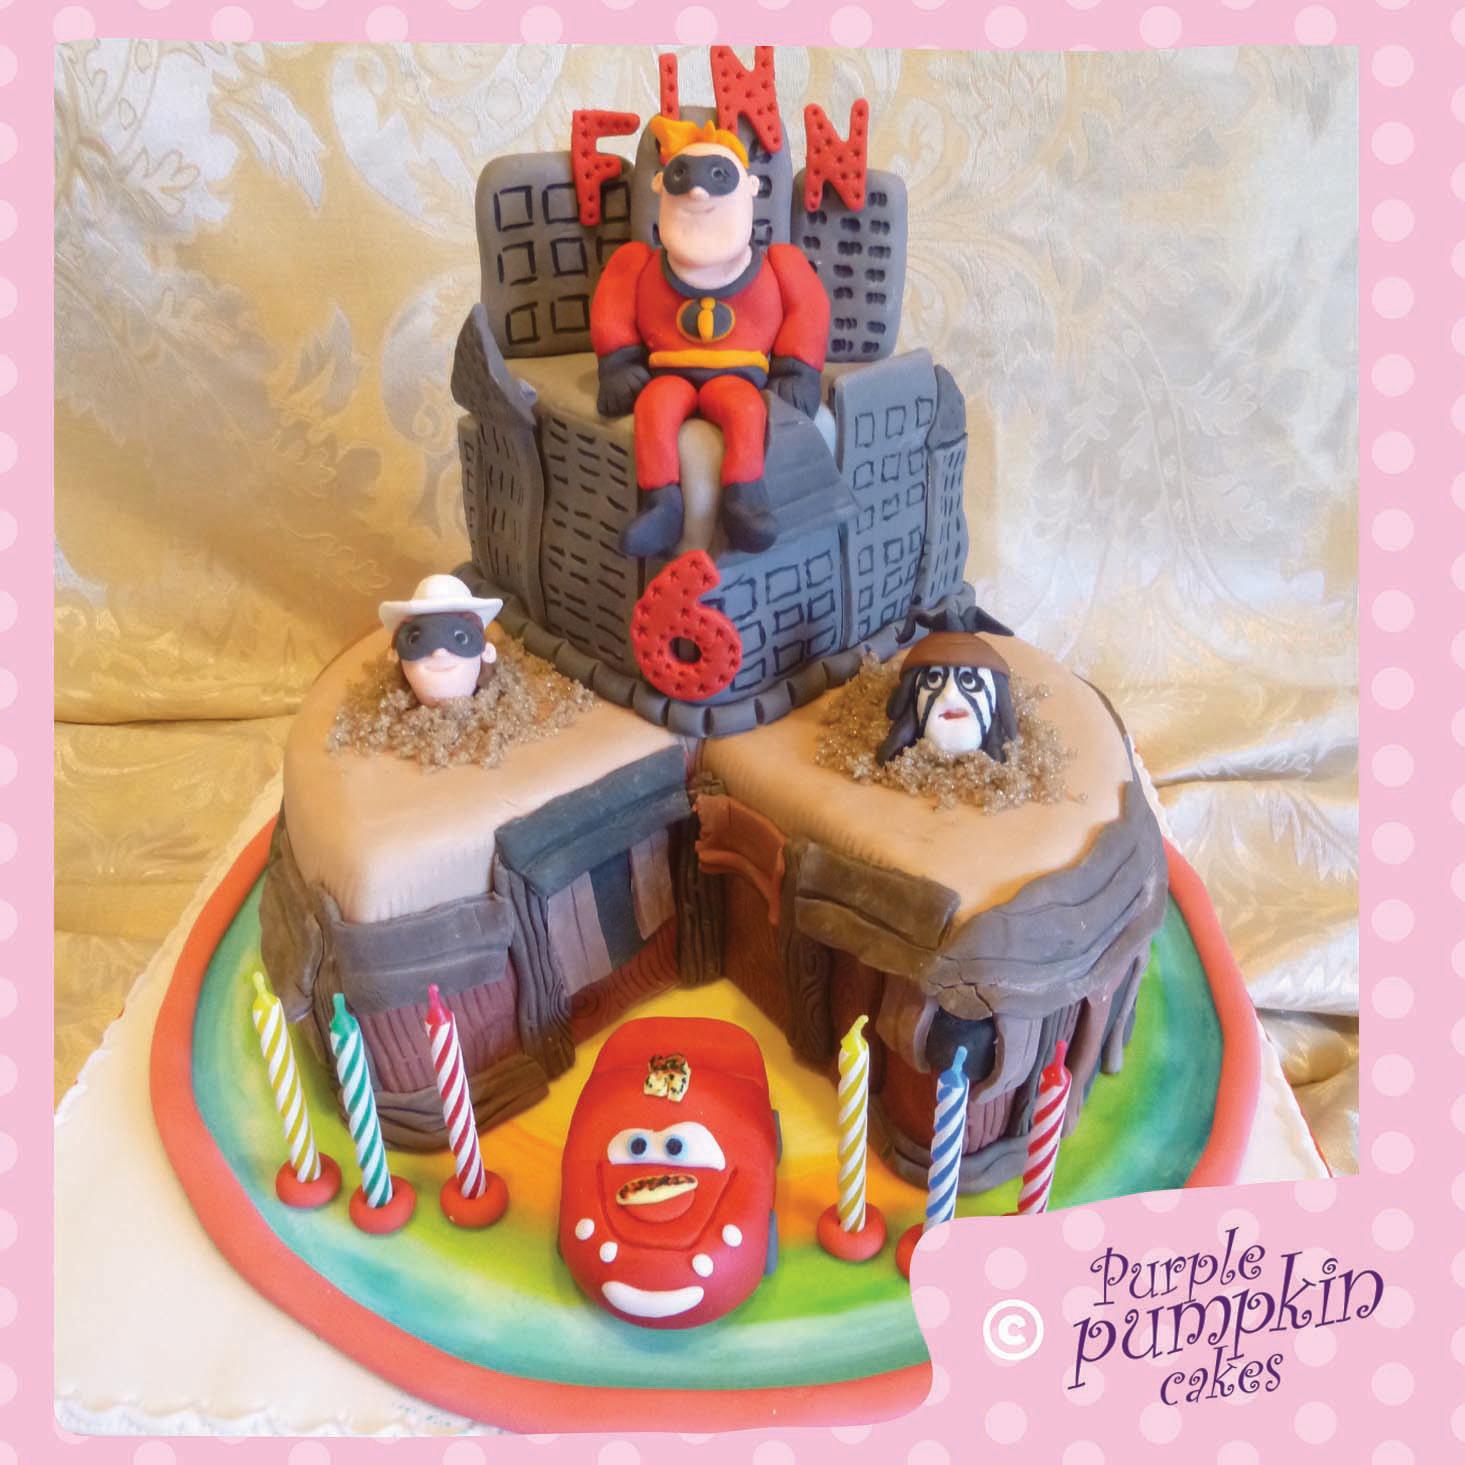 Disney infinity themed wedge cake